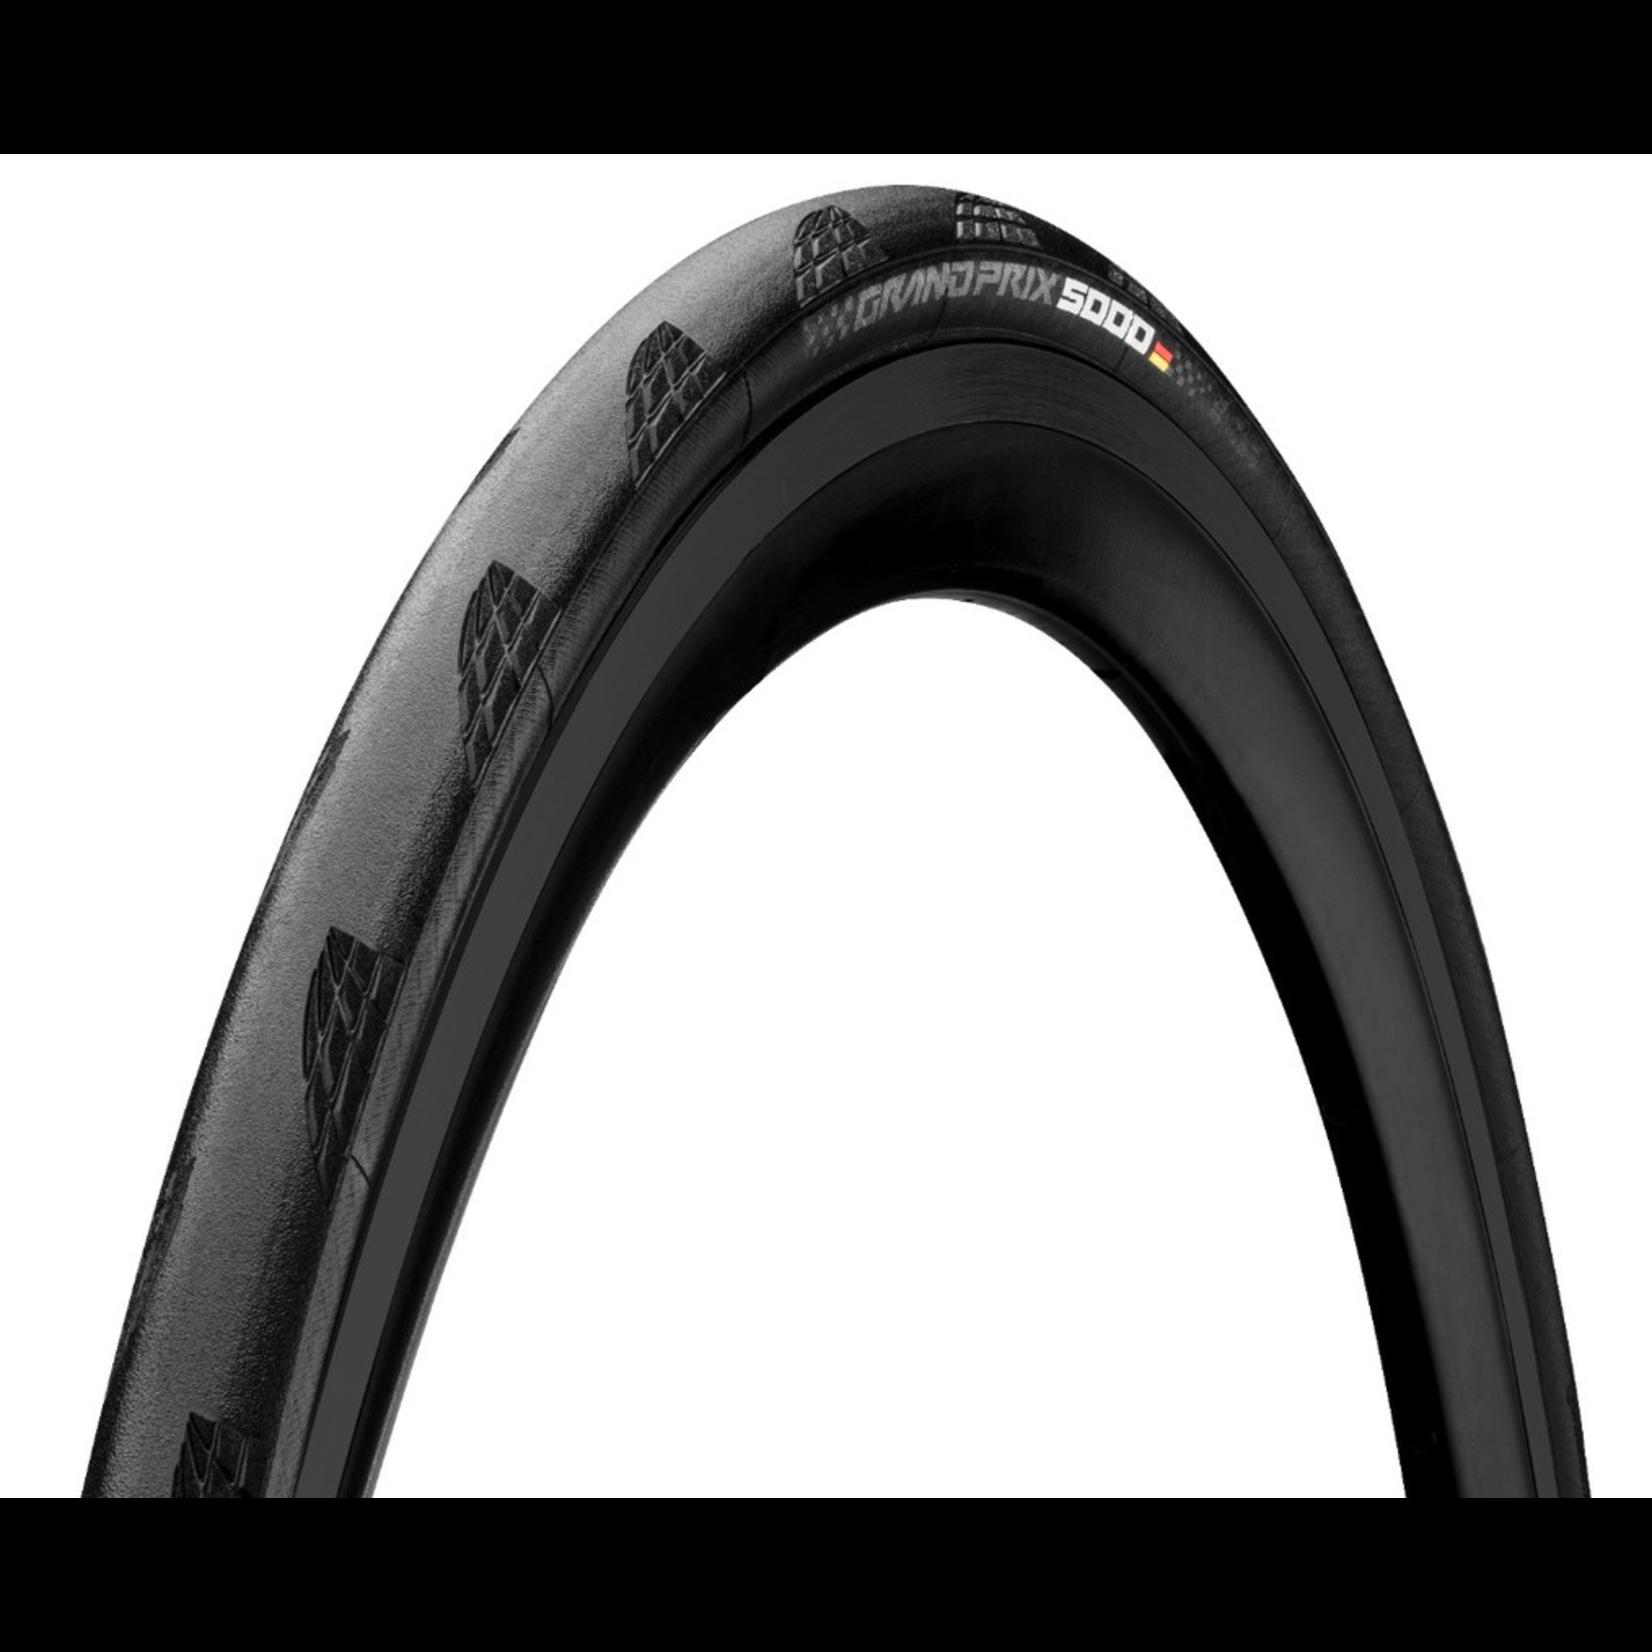 Continental Continental Grand Prix 5000 Folding Bead Tubeless Tire, 700x32c